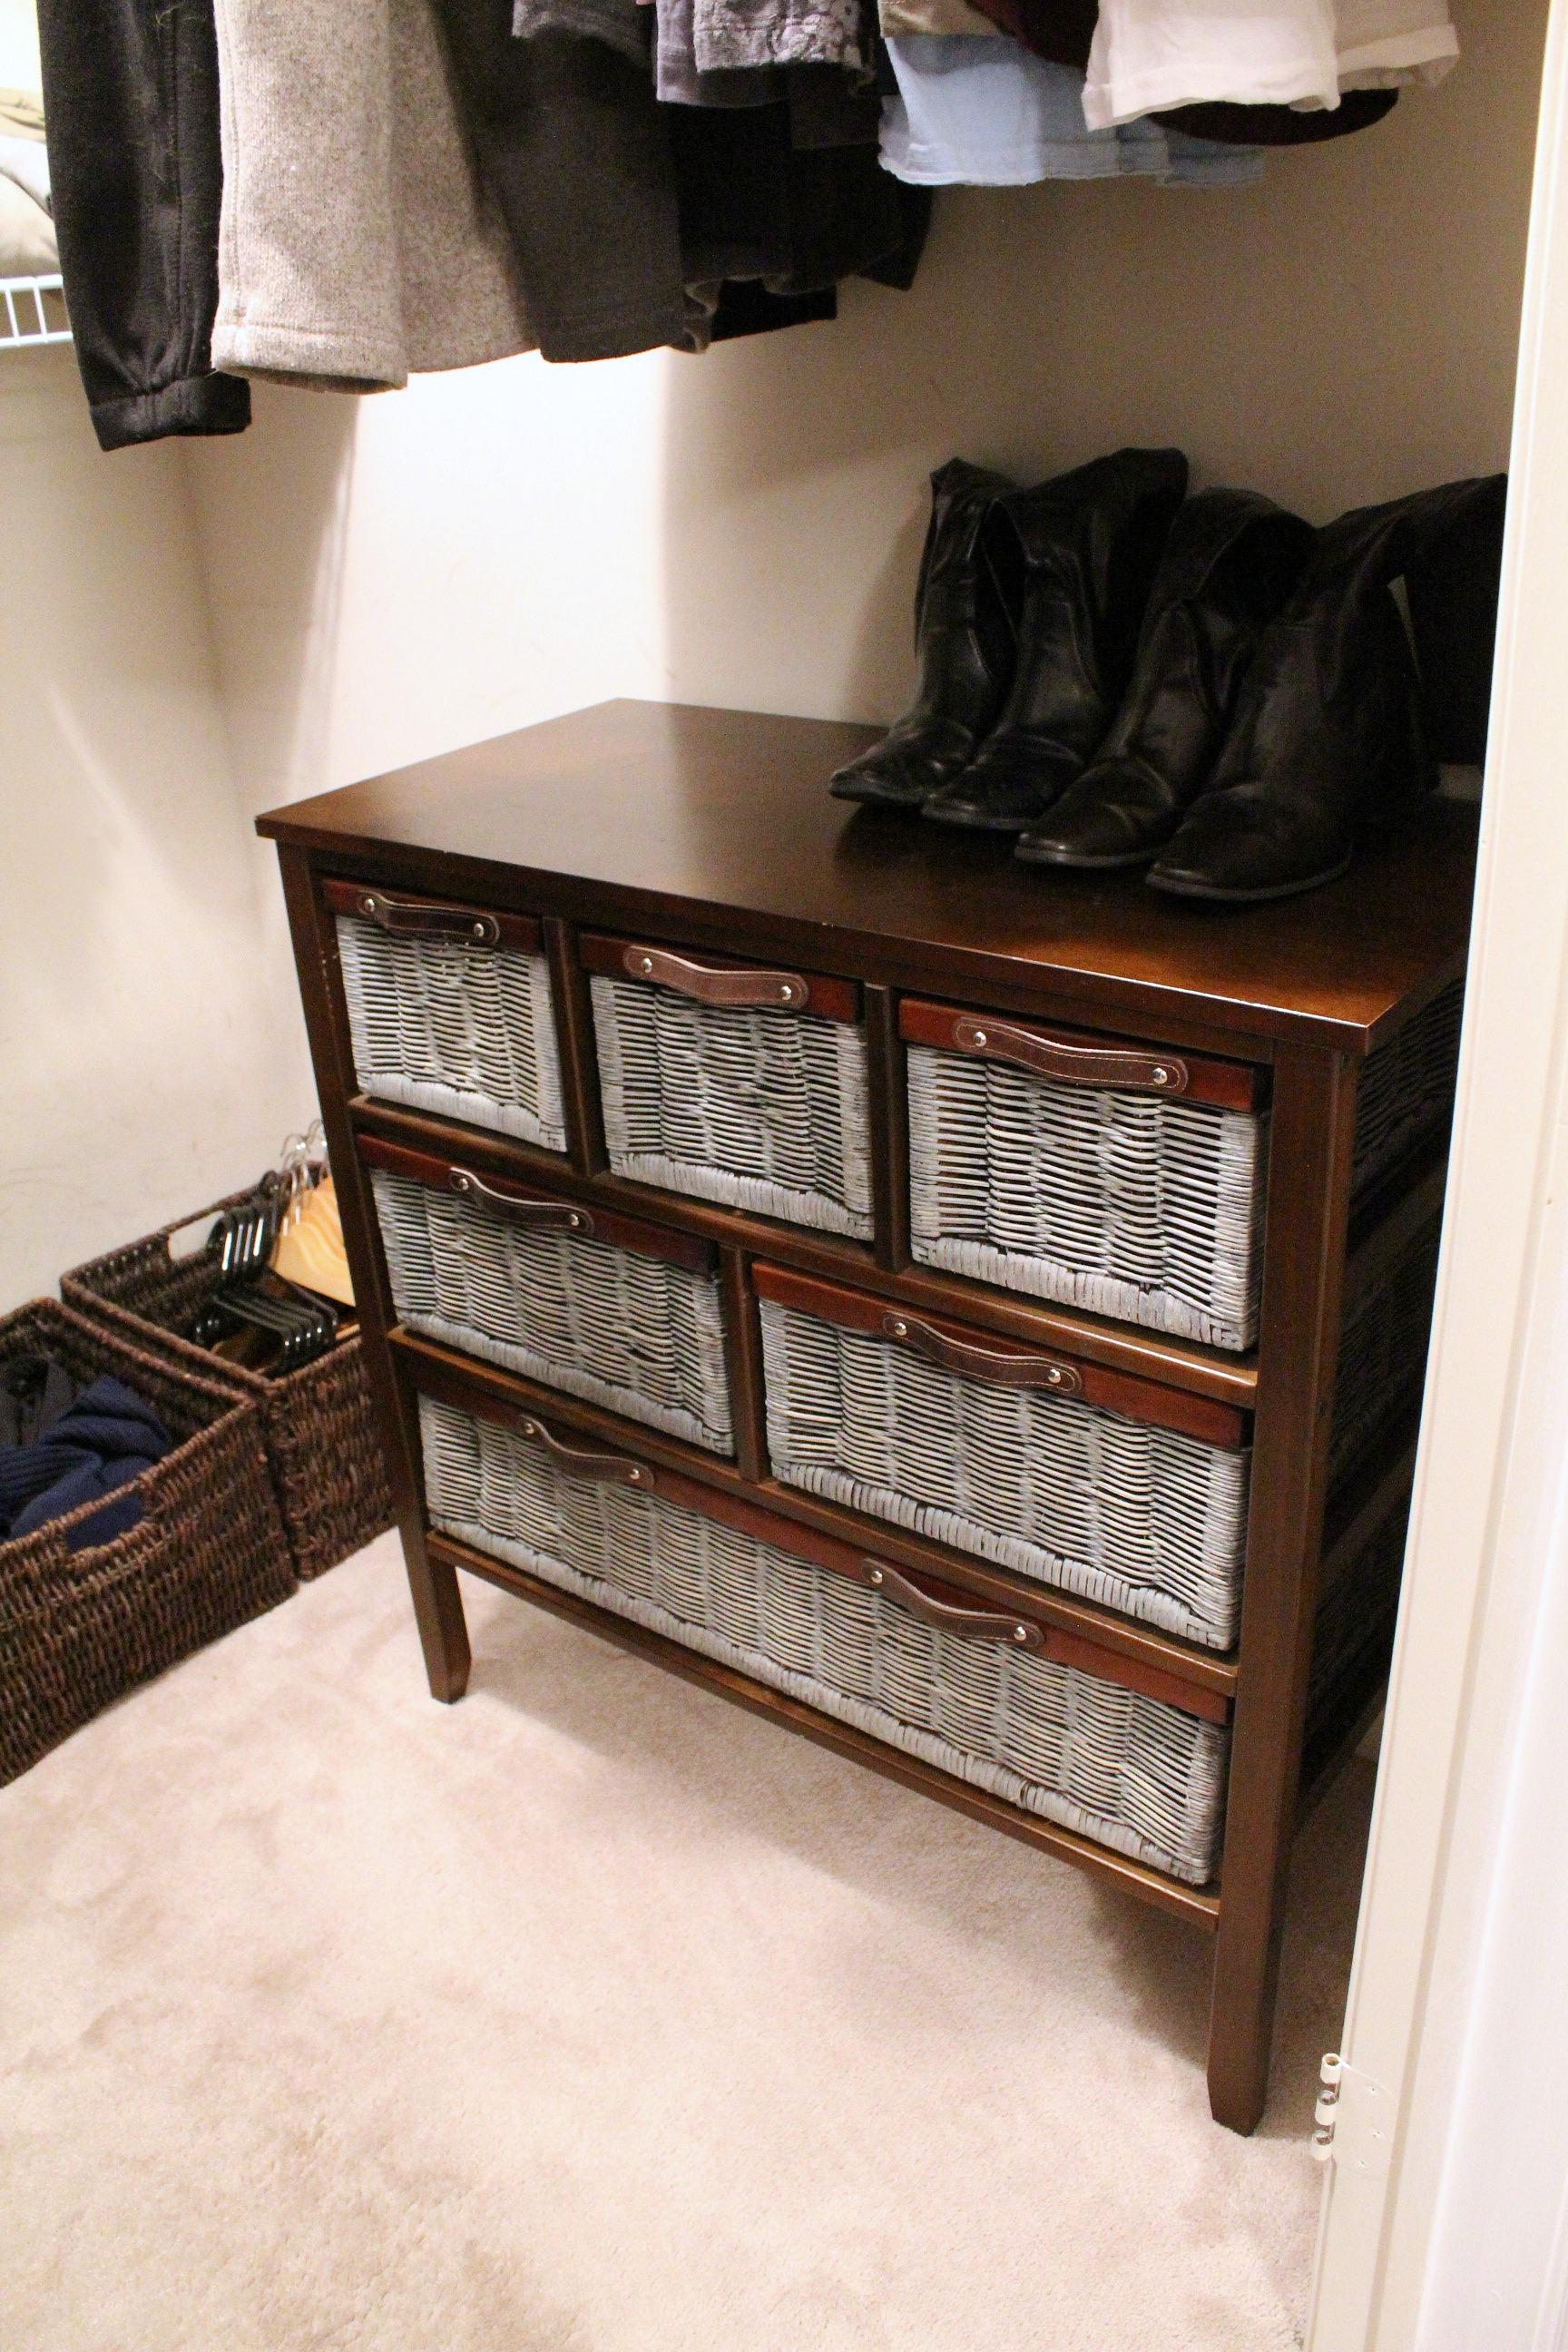 turtles and tails closet craft room organization. Black Bedroom Furniture Sets. Home Design Ideas